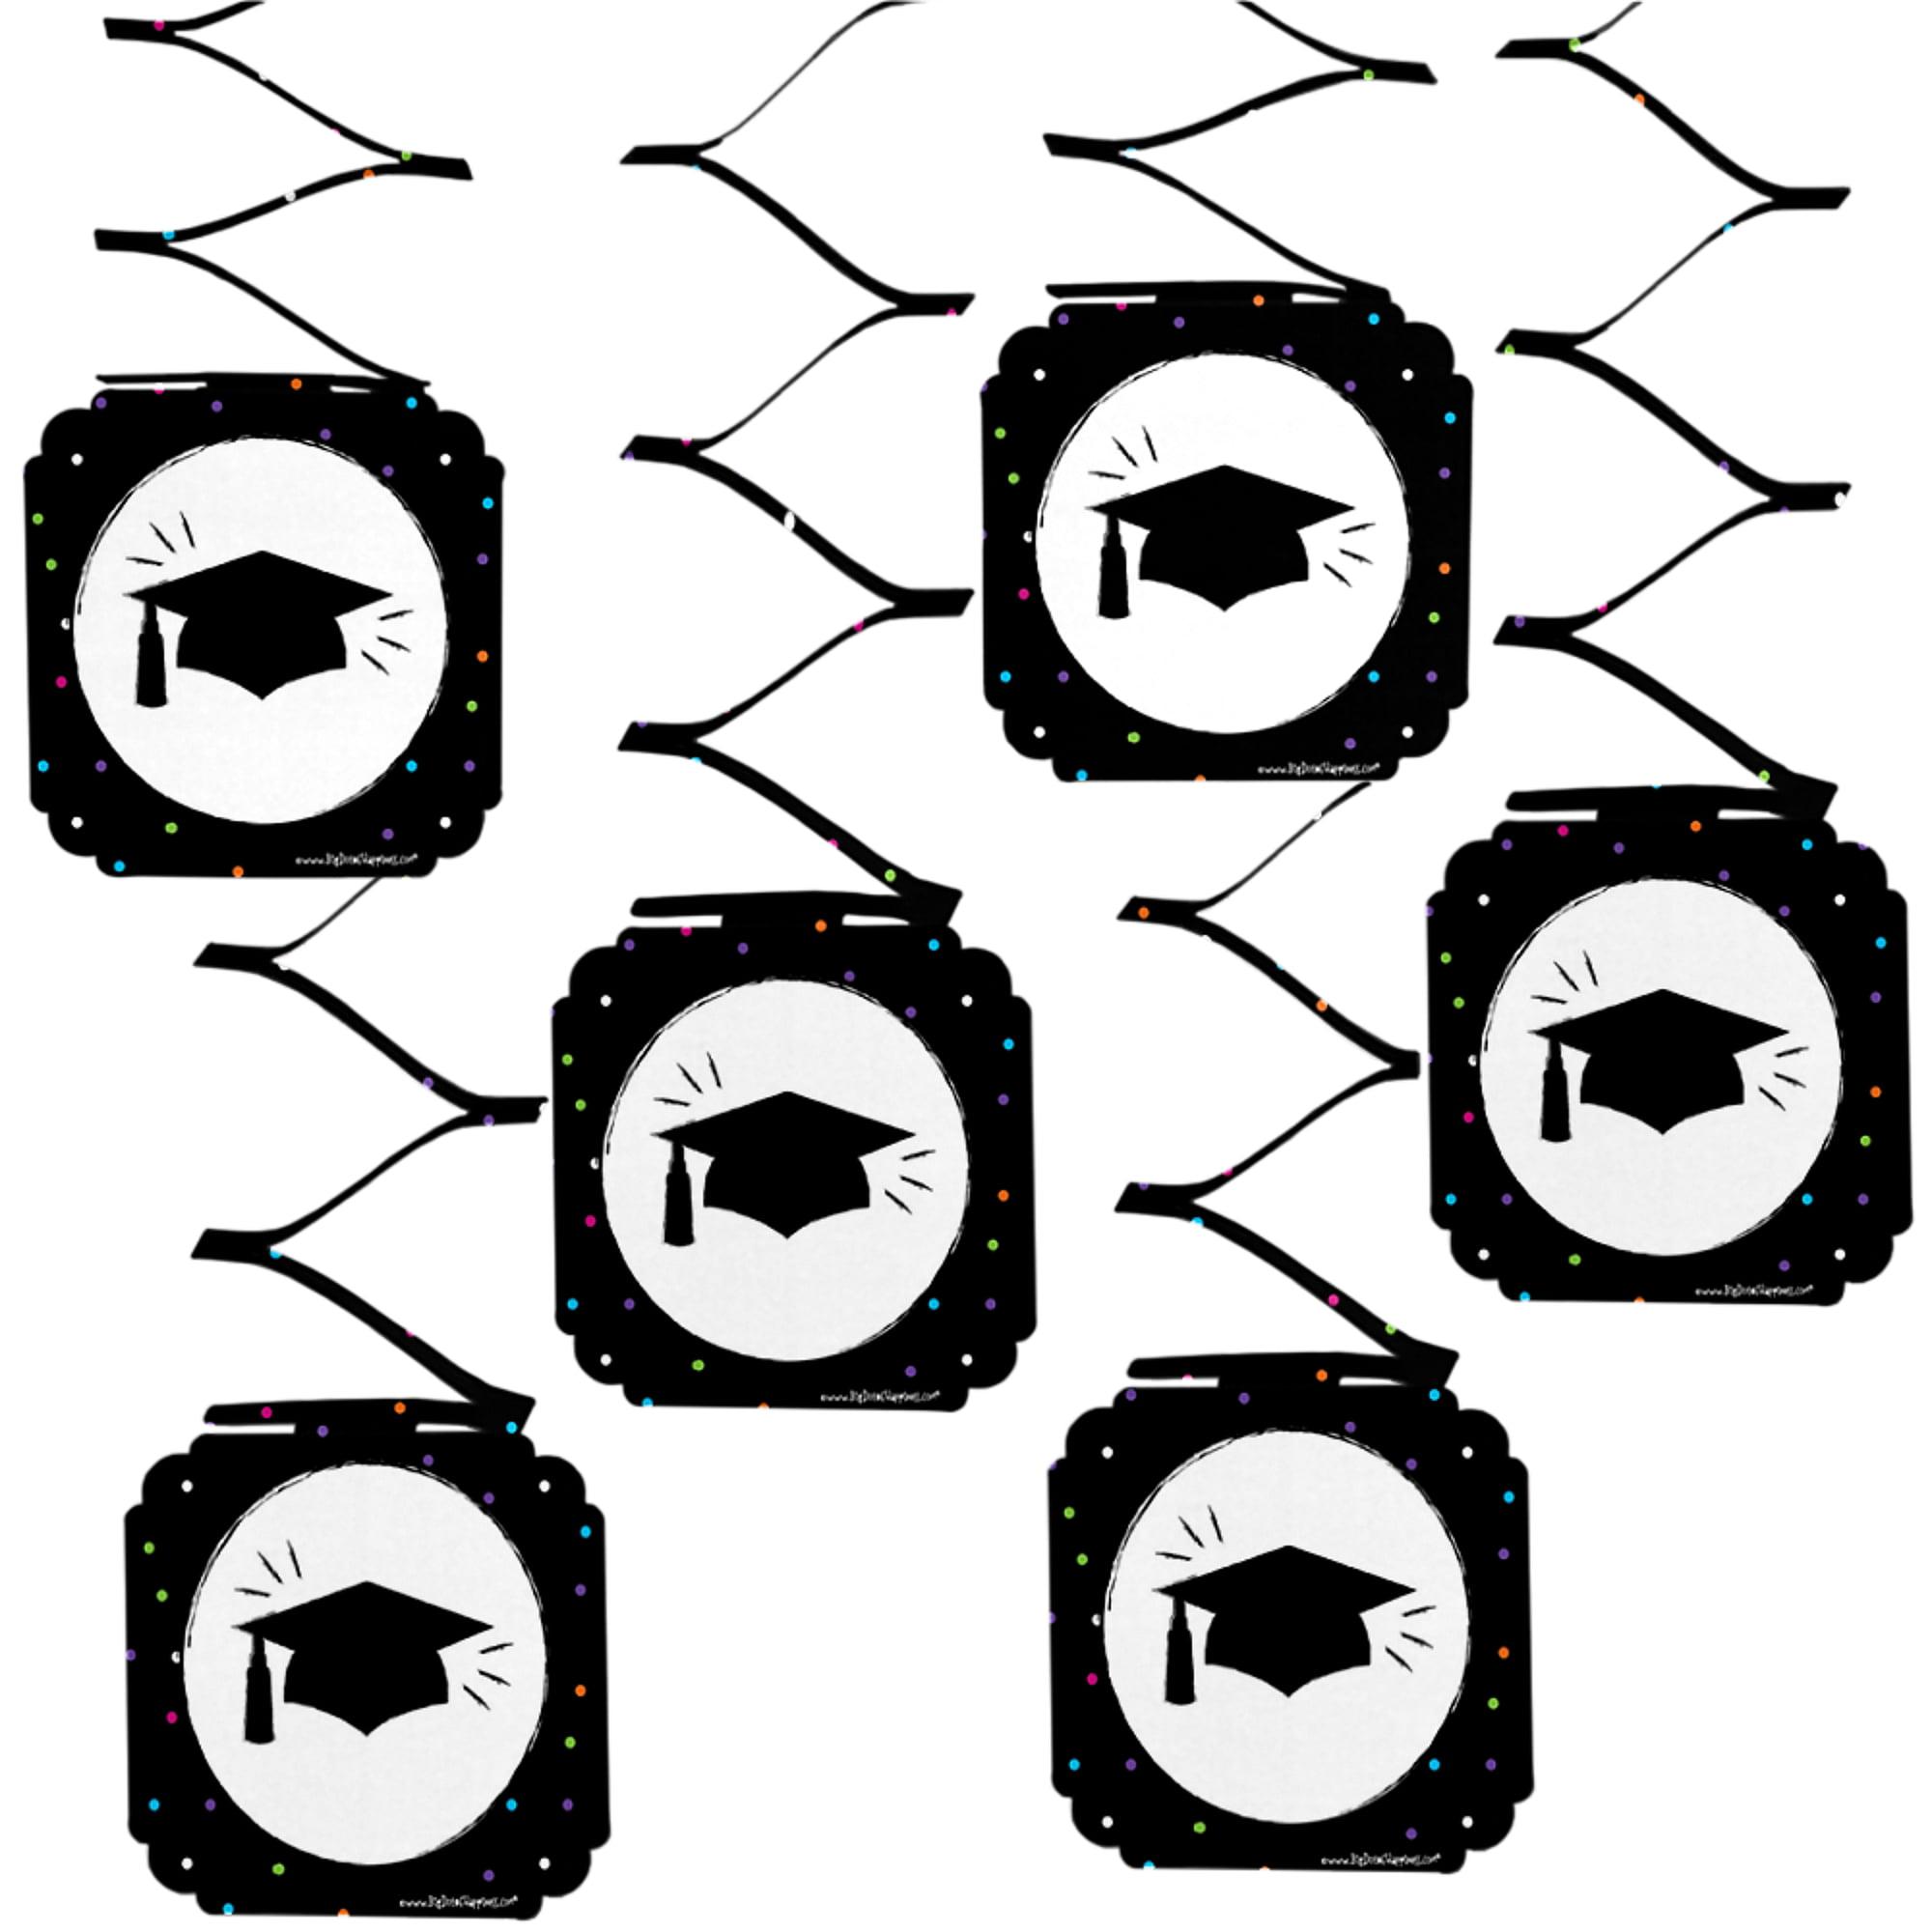 Hats Off Grad - Graduation Party Hanging Decorations - 6 Count